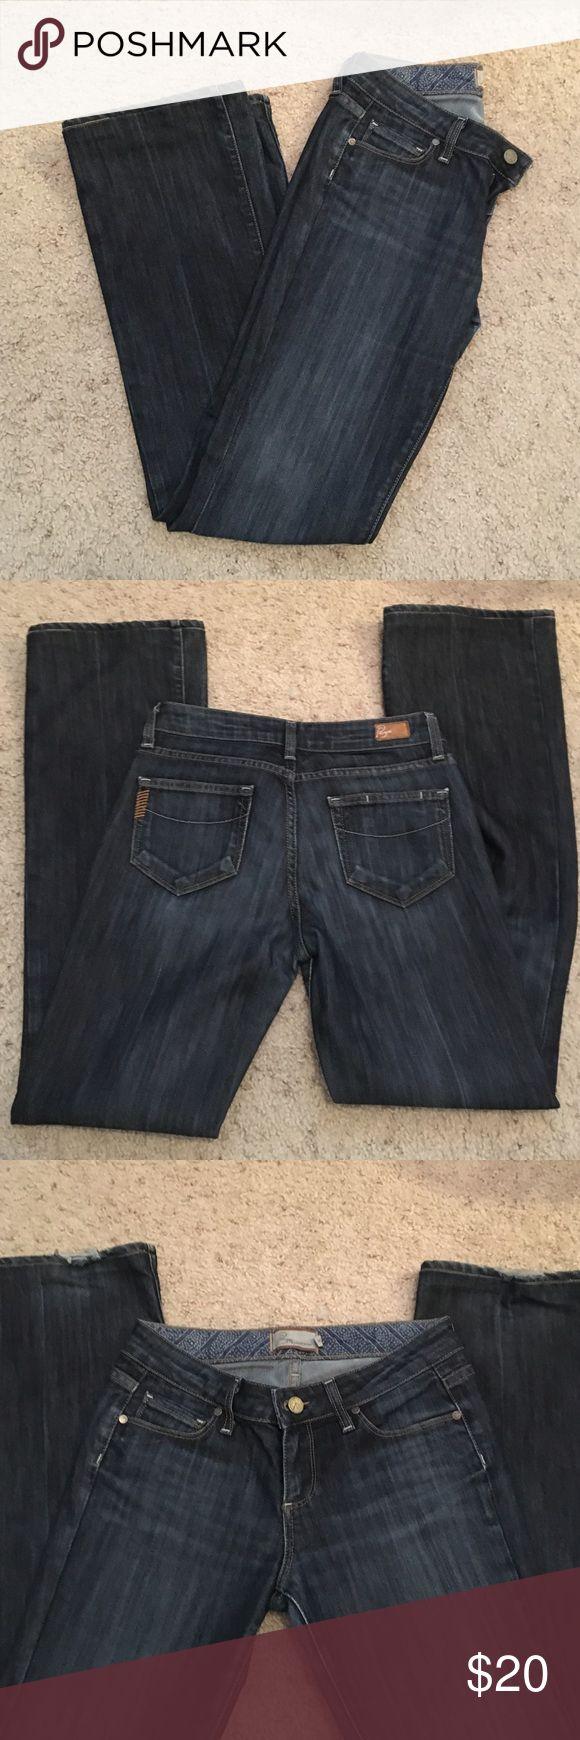 Paige jeans size 26 boot cut Paige jeans. Boot cut. Size 26. Little wear at the cuffs Paige Jeans Jeans Boot Cut